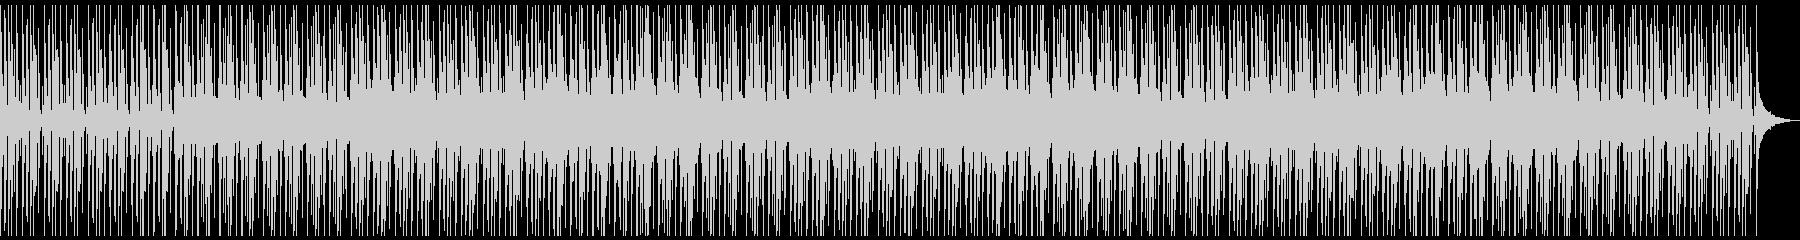 528Hz日常のストレス解放の瞑想曲2の未再生の波形